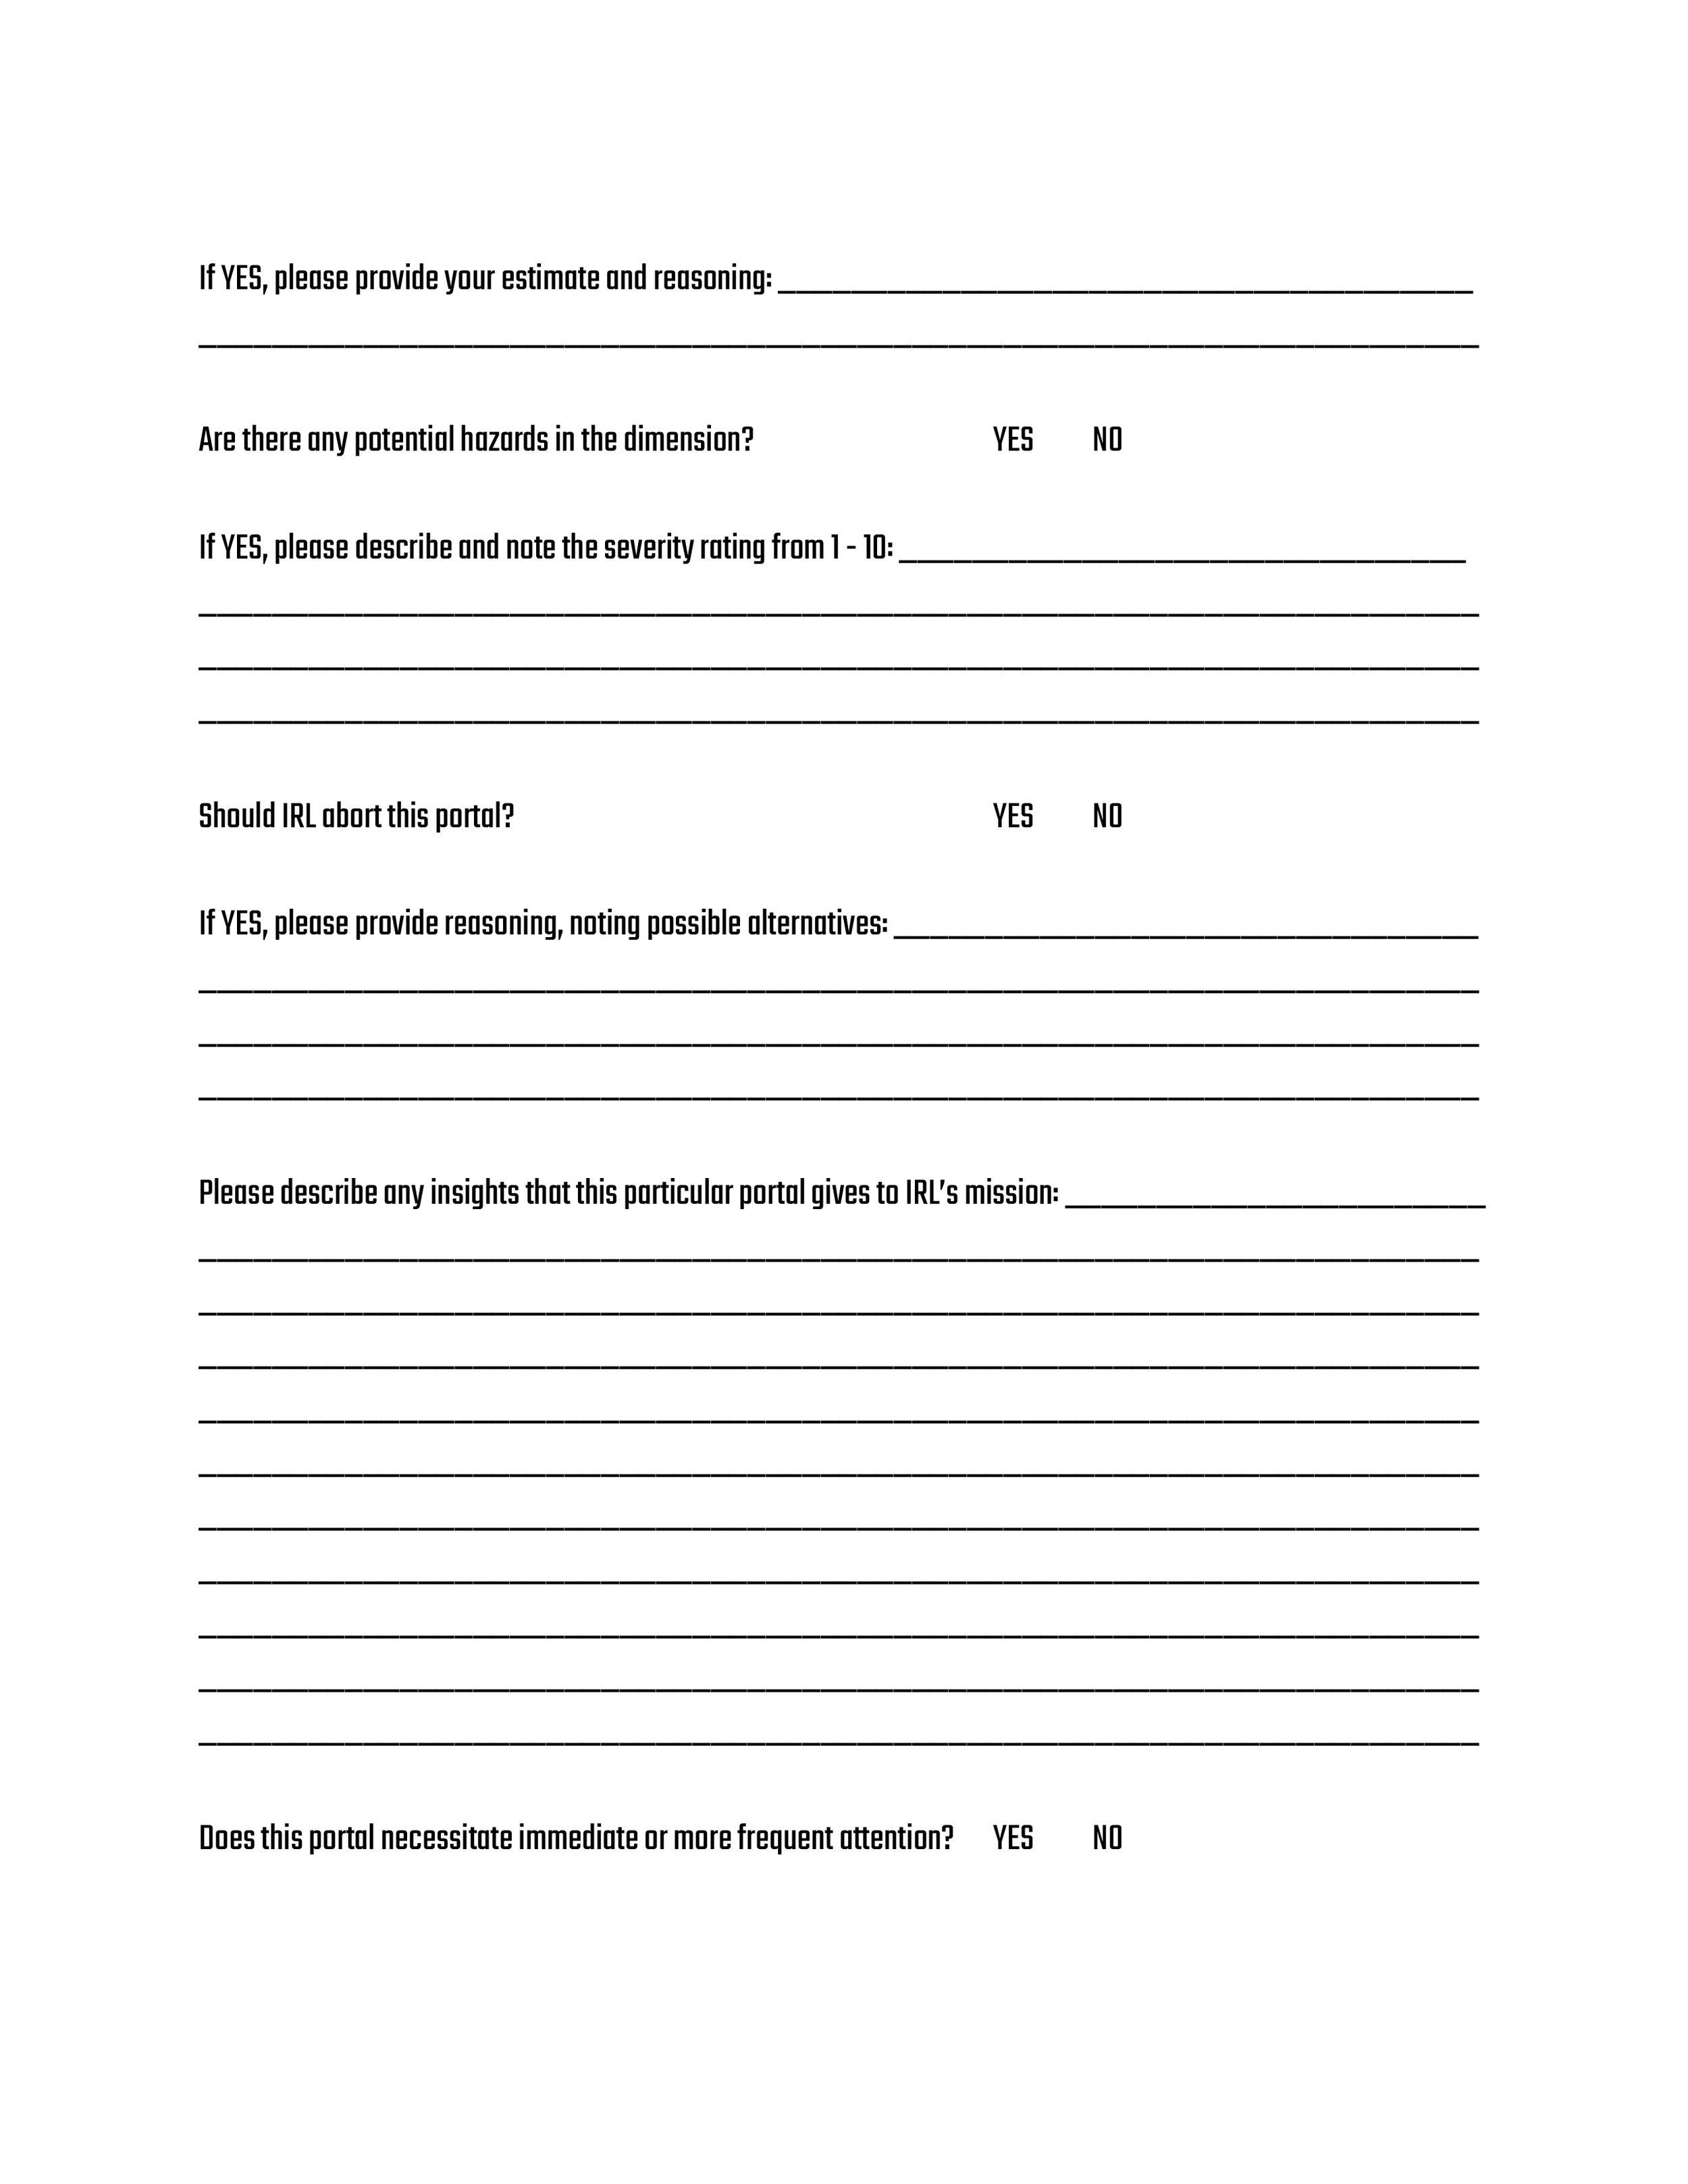 IRL Contract 5.jpg